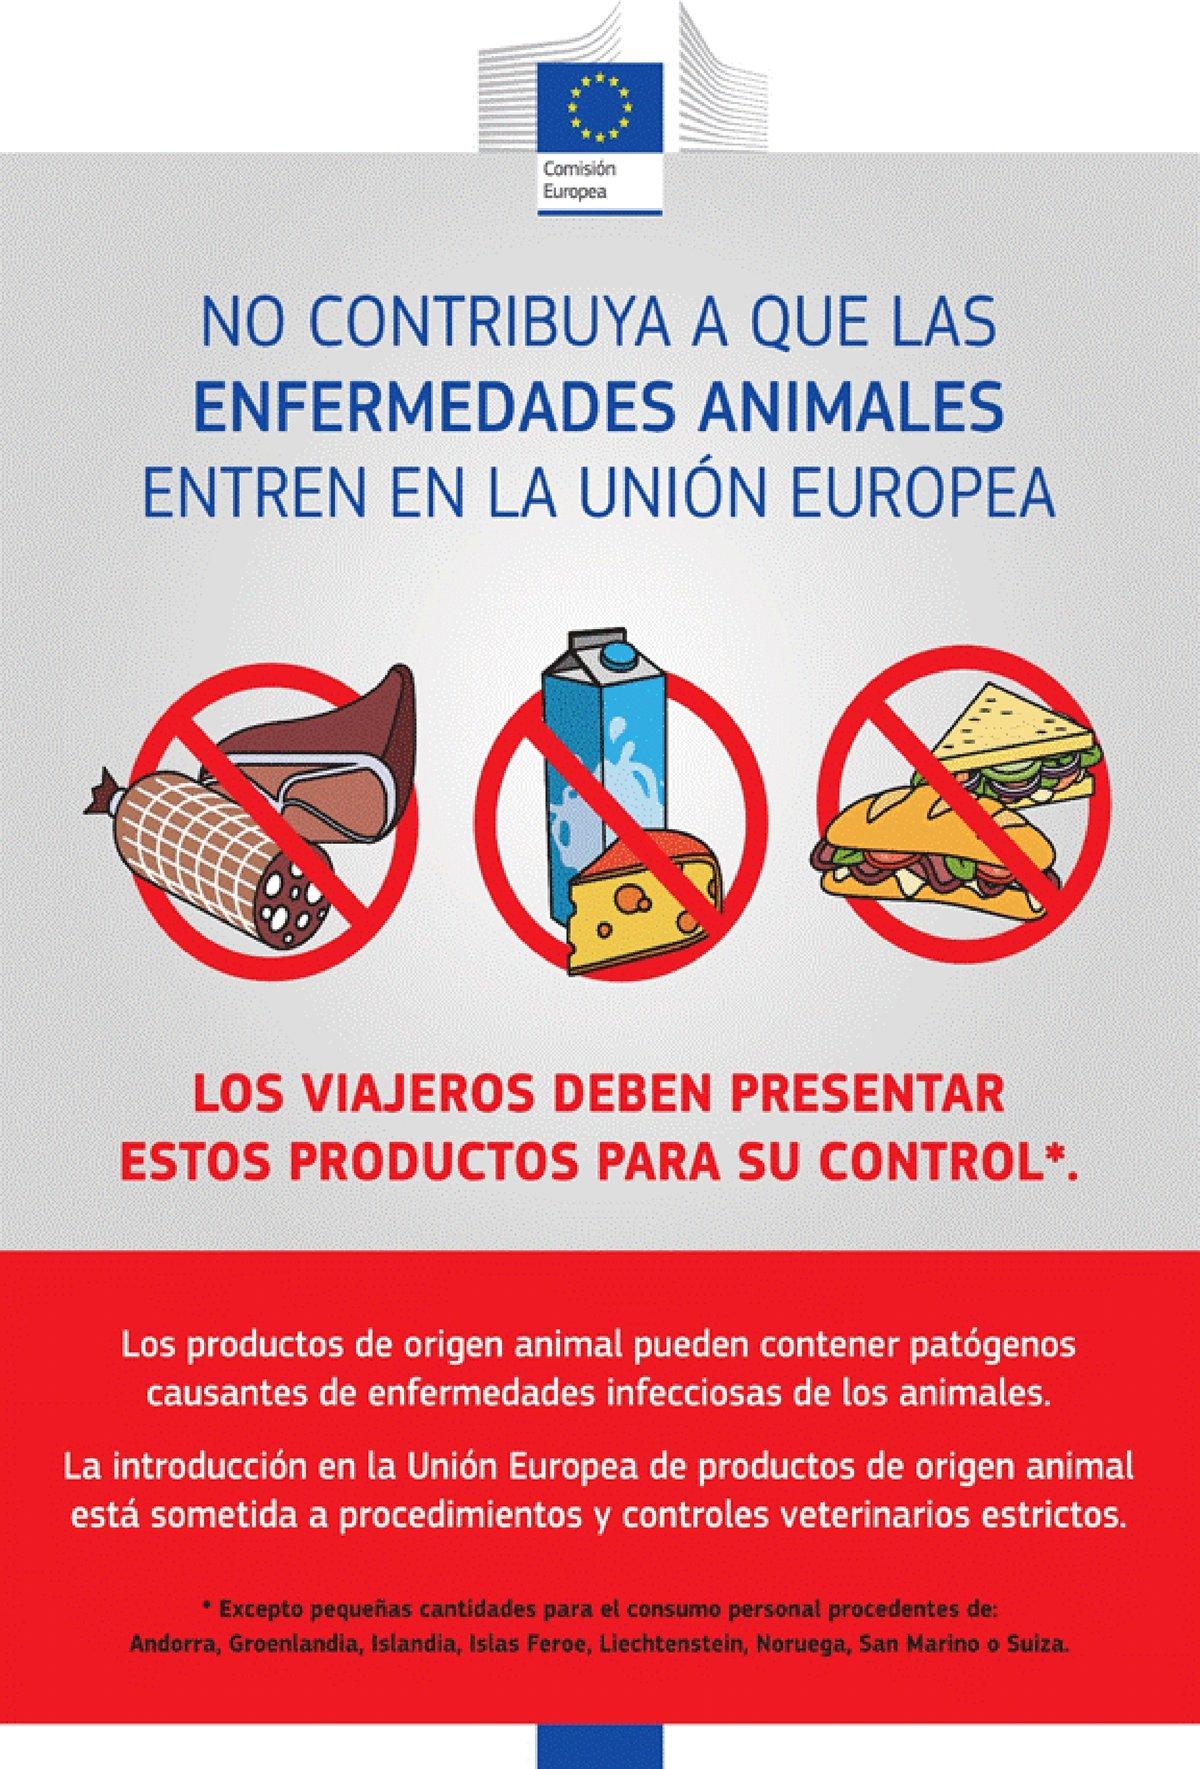 Imagen: https://eur-lex.europa.eu/resource.html?uri=uriserv:OJ.L_.2019.321.01.0045.01.SPA.xhtml.L_2019321ES.01005701.tif.jpg